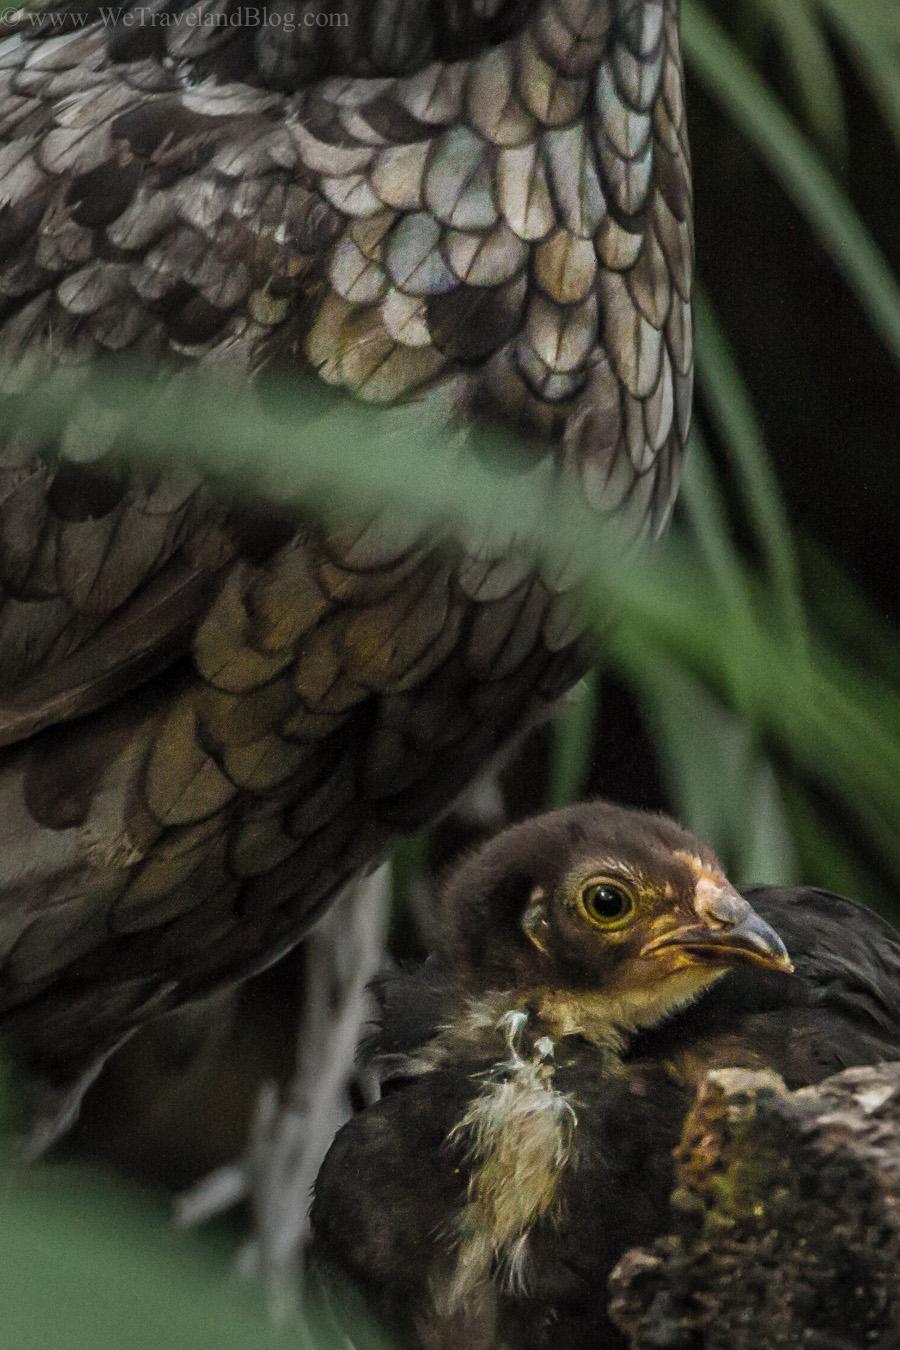 chick, chicken, feathers, beautiful, caring, mother, hen, dominican republic, http://wetravelandblog.com